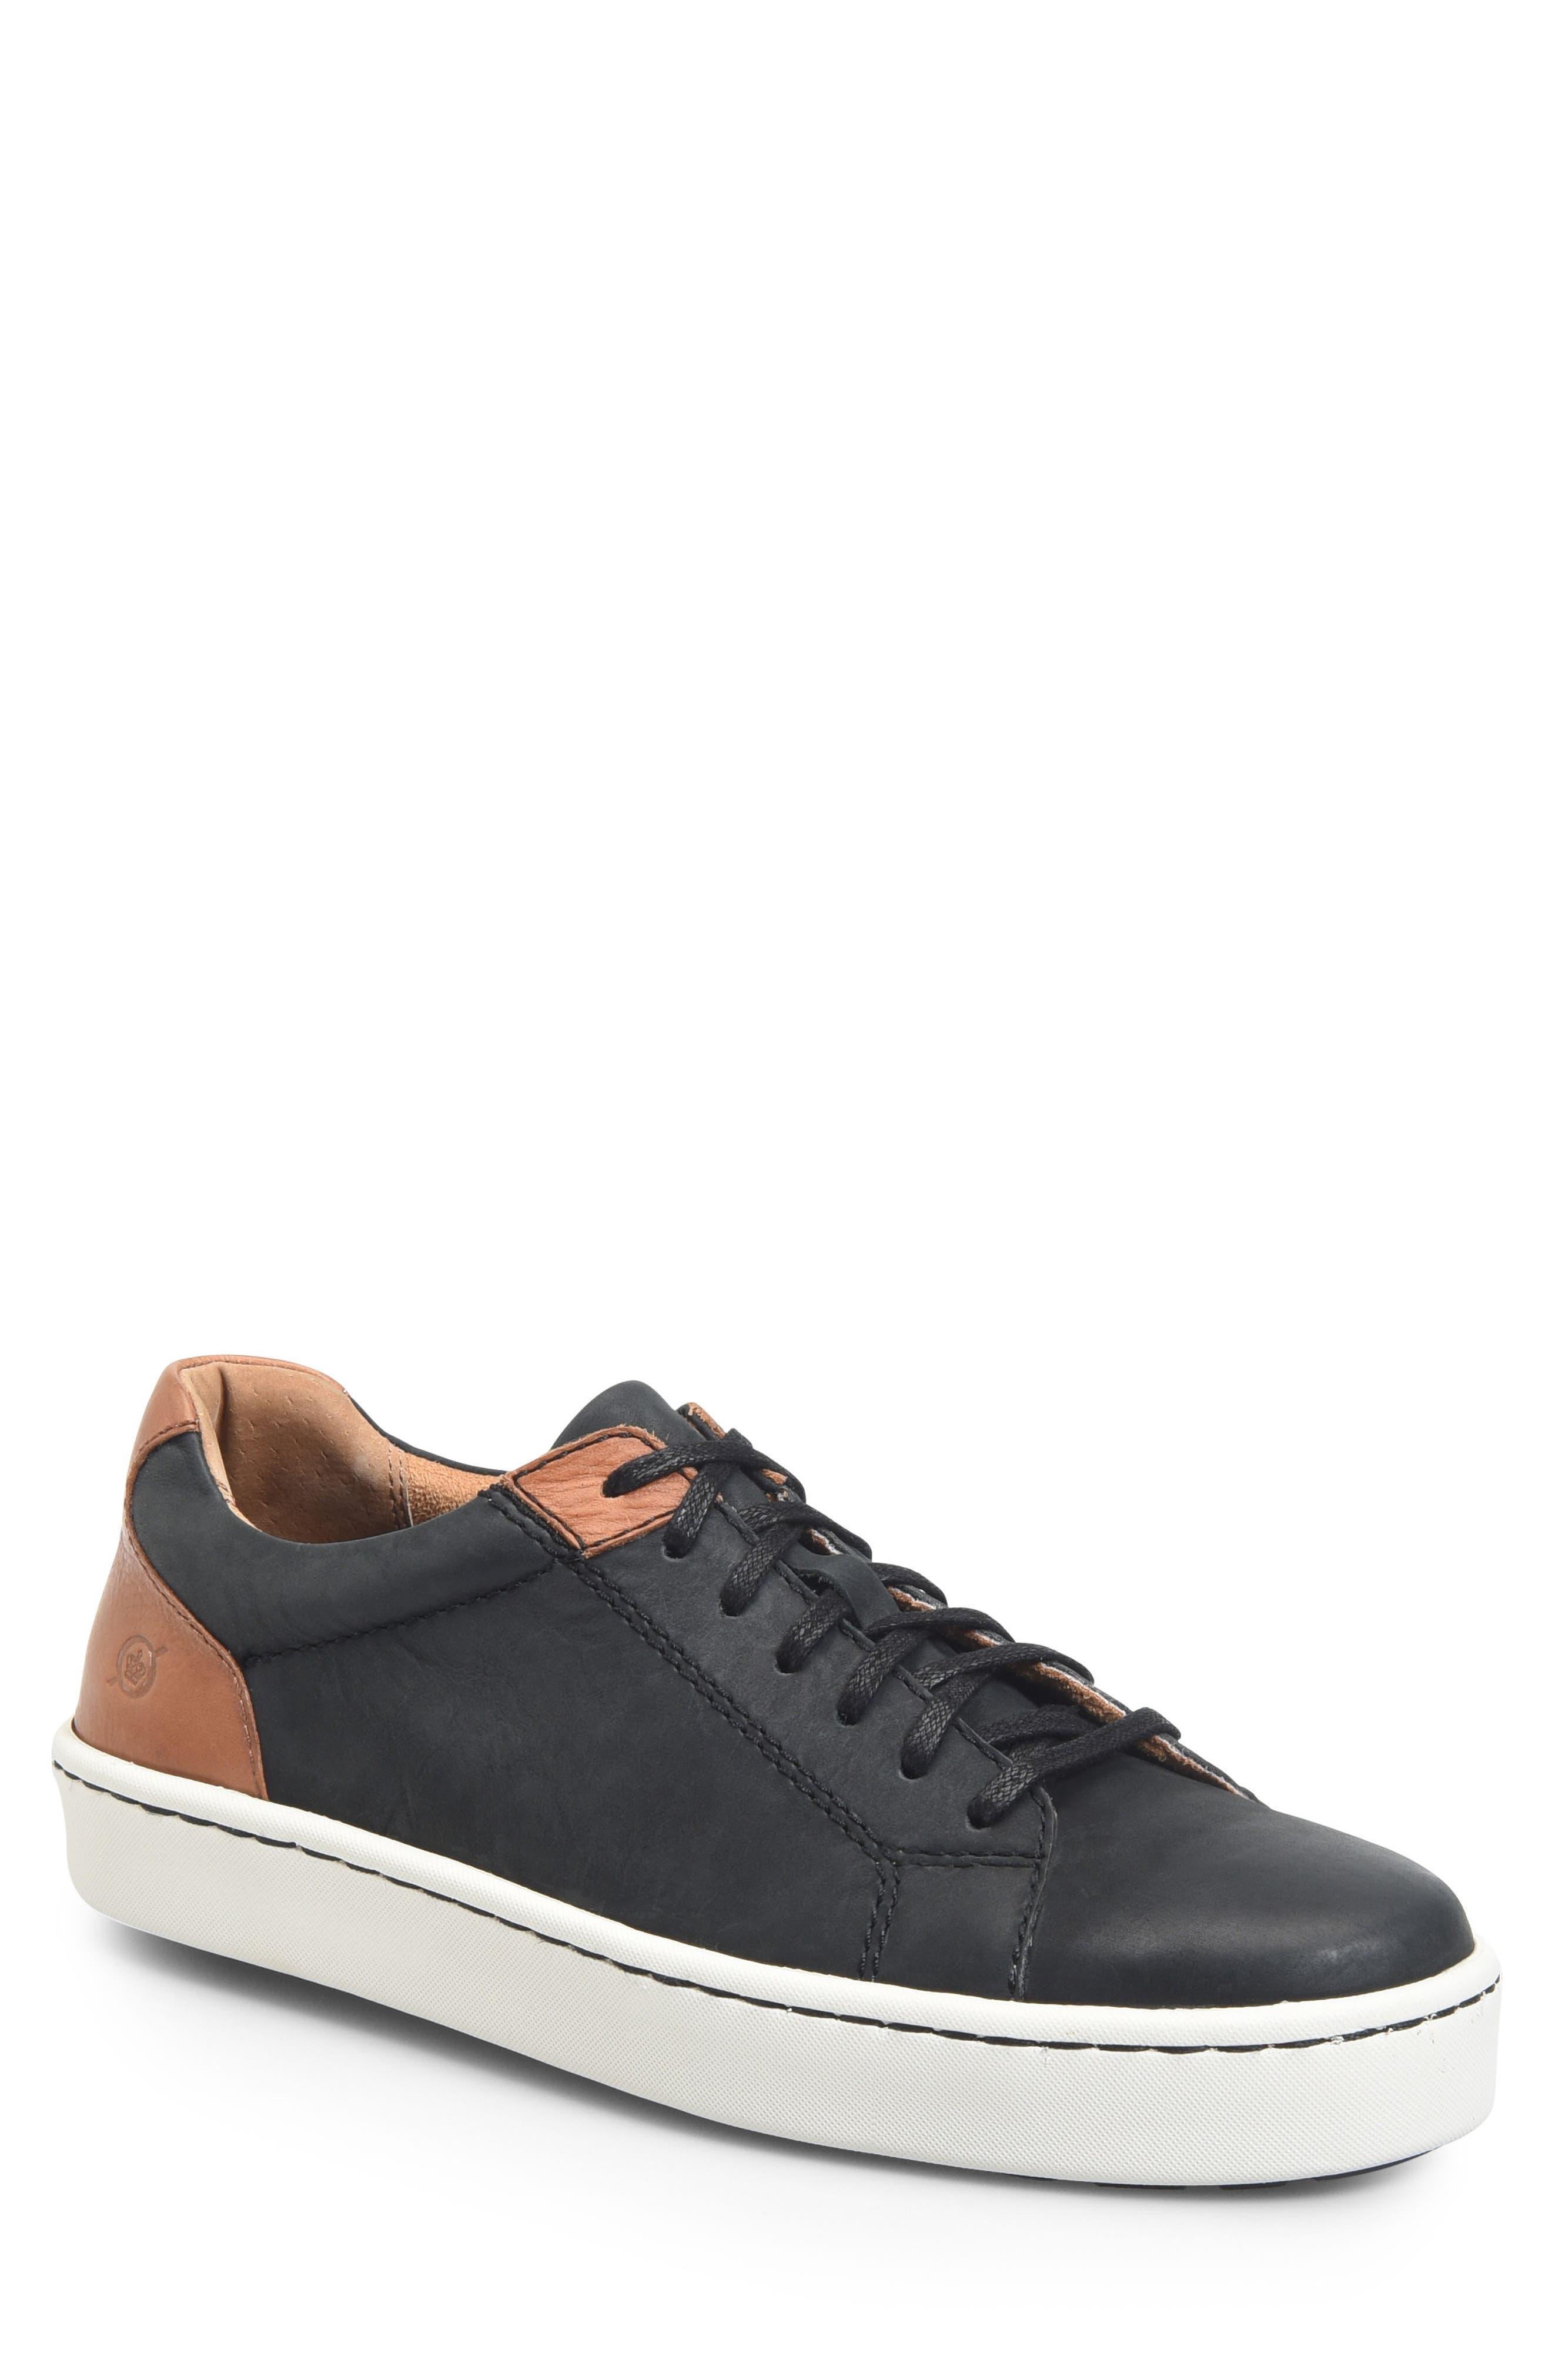 Jib Sneaker,                             Main thumbnail 1, color,                             001